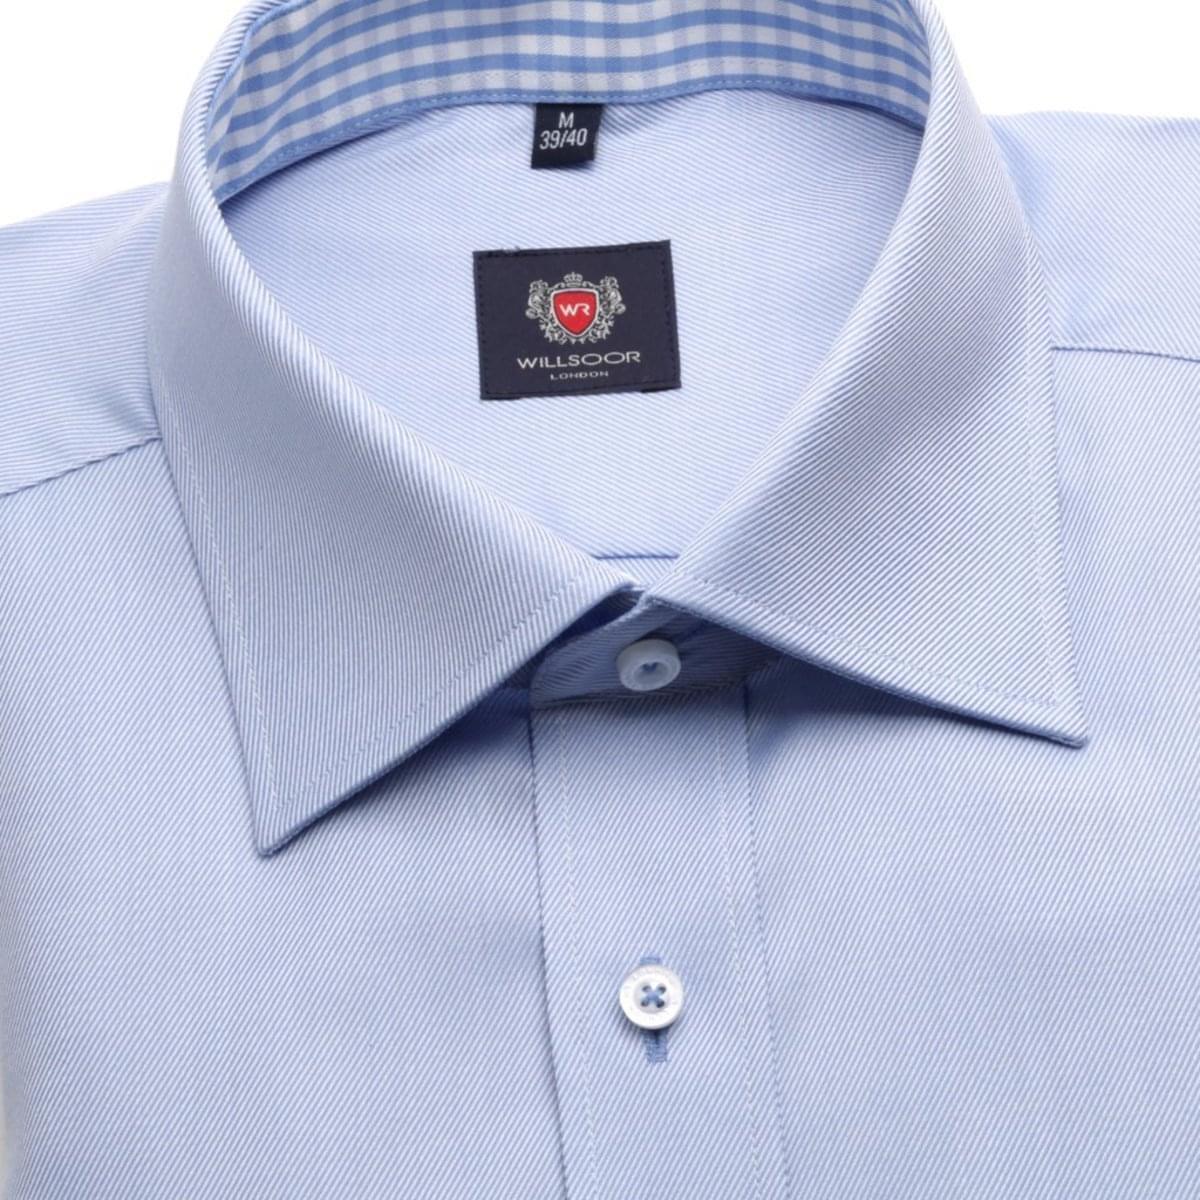 Willsoor Pánská košile WR London (výška 176-182) 1988 176-182 / S (37/38)